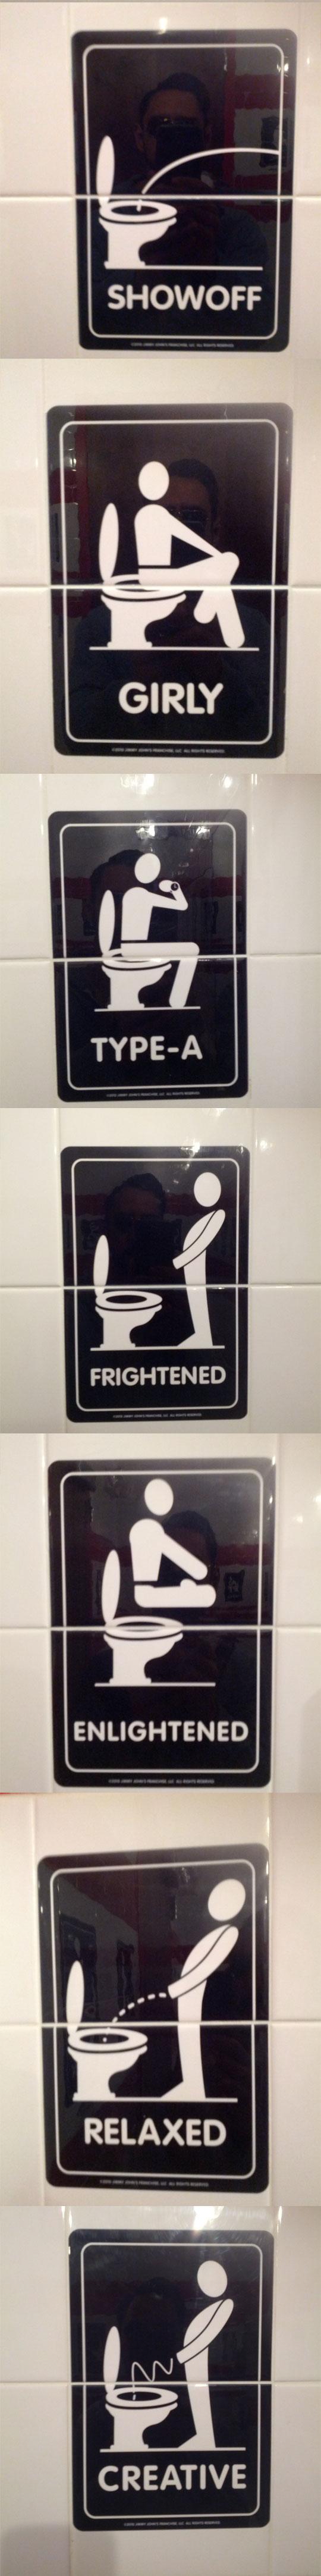 funny-bathroom-tiles-type-user-peeing